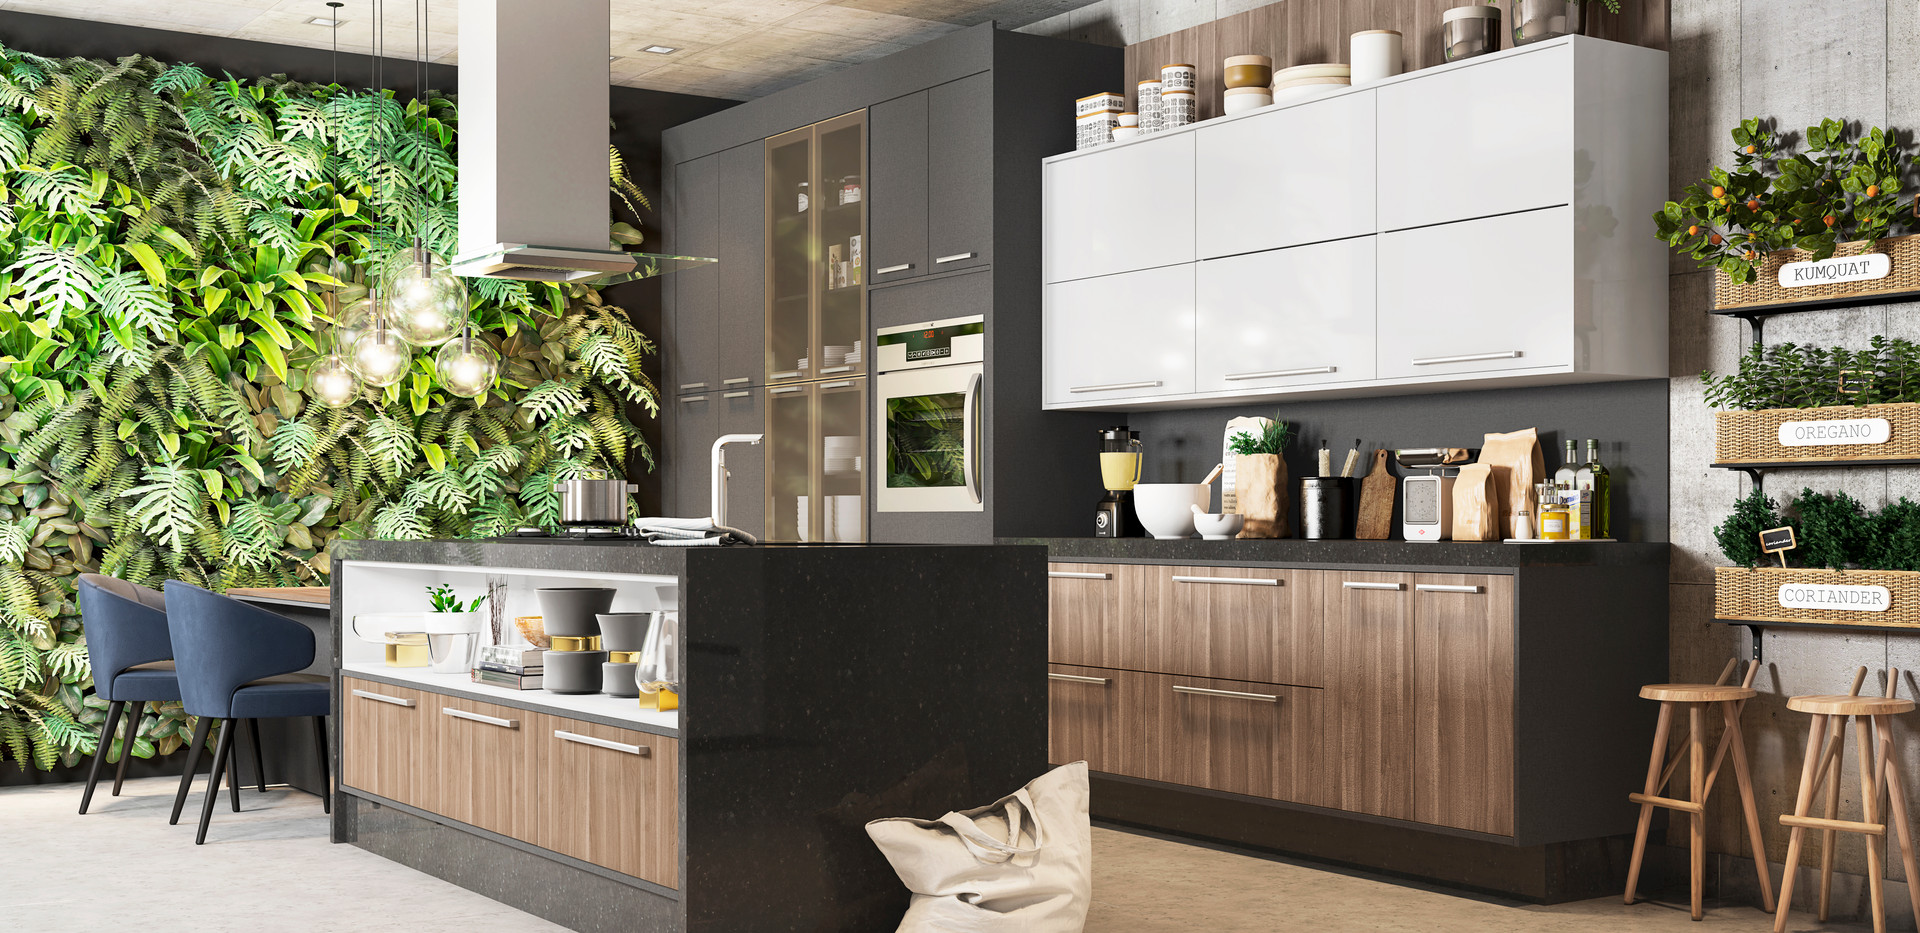 Cozinha 01 - Grafitto - Lanarca -Branco